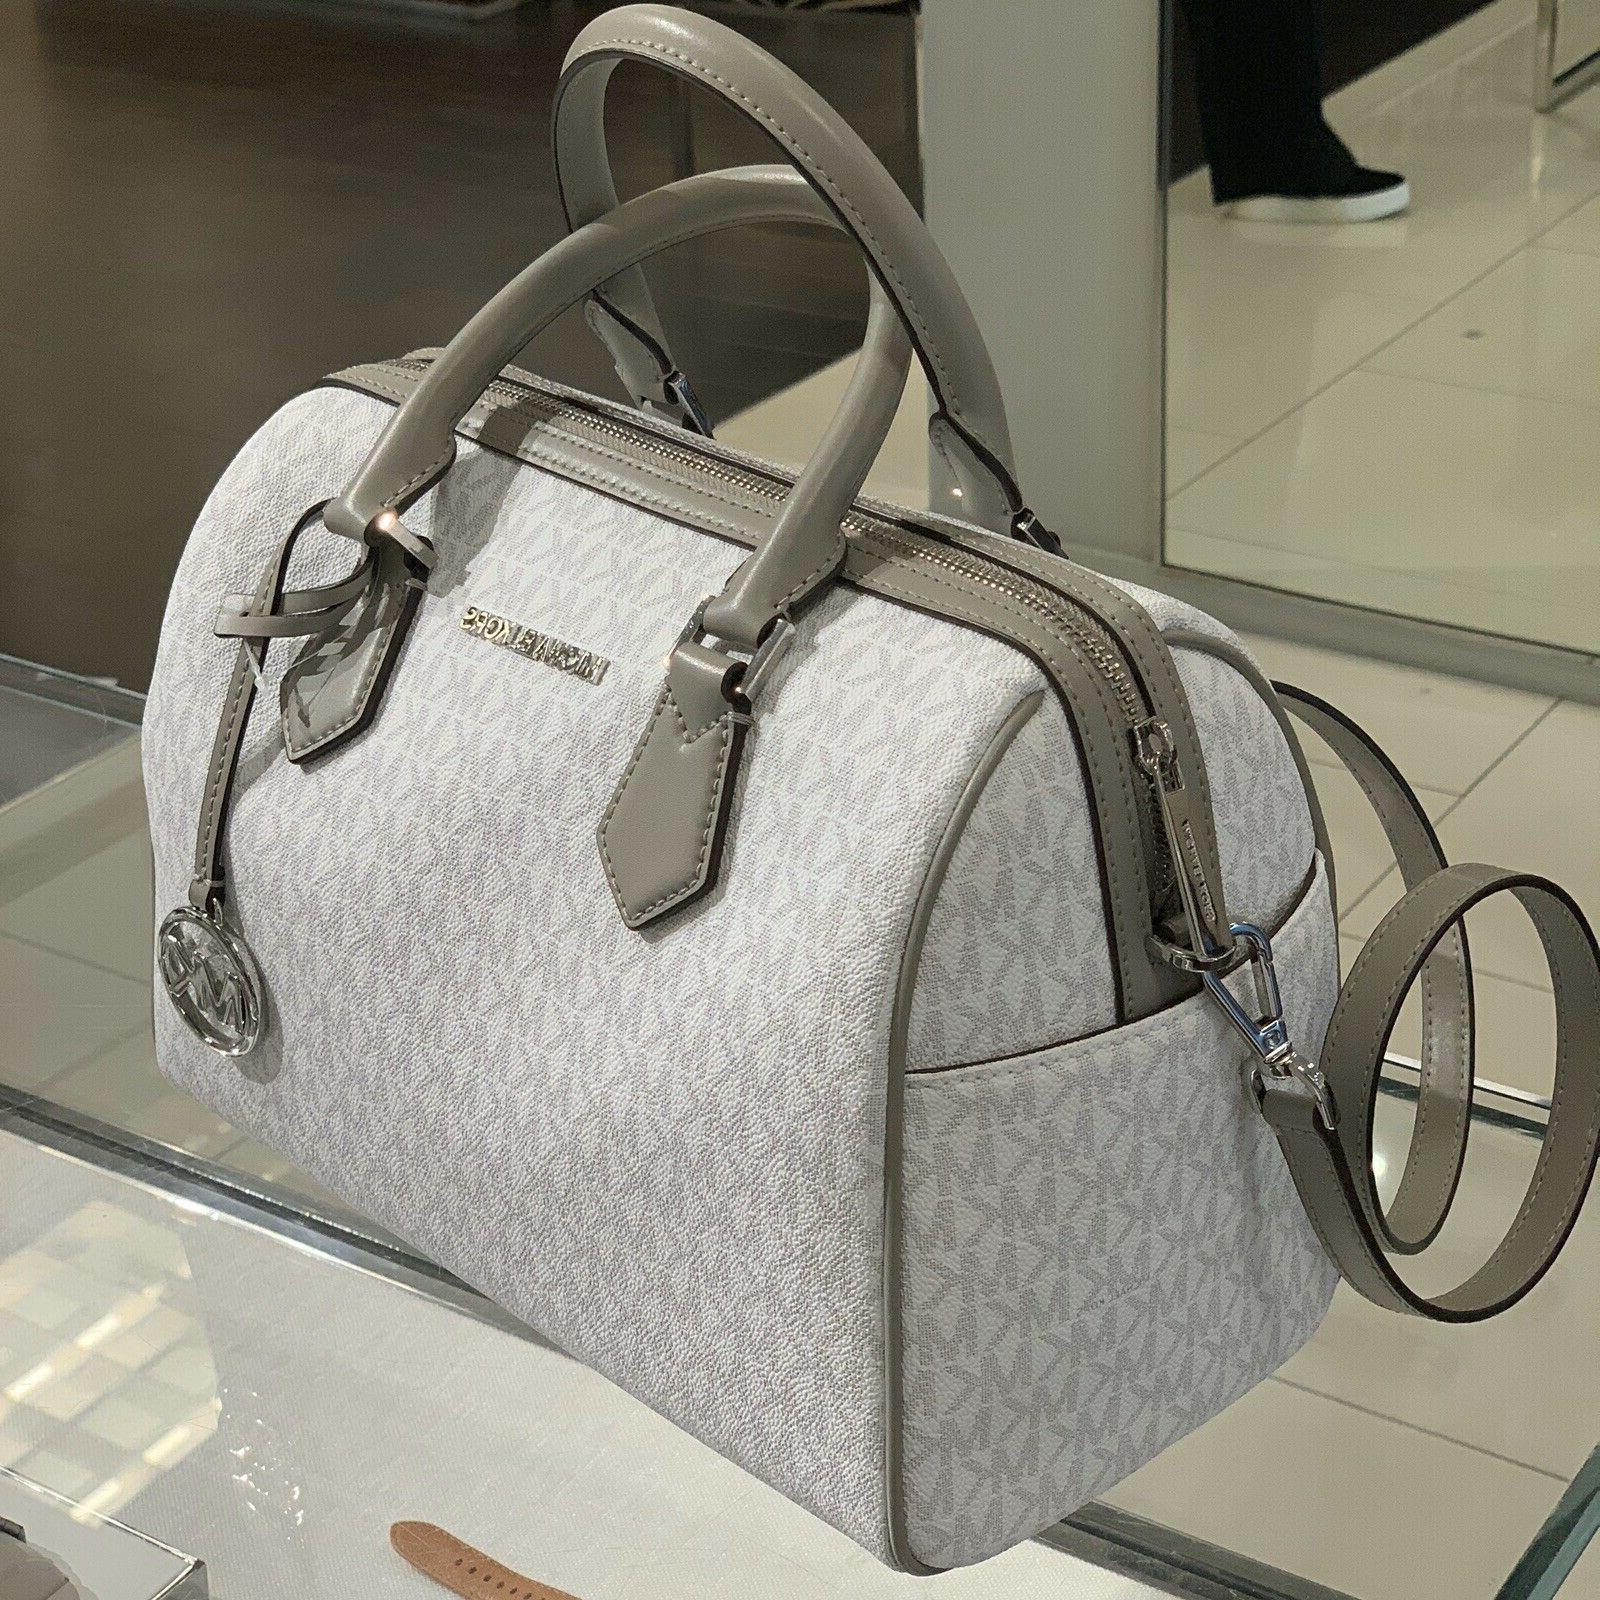 Michael Kors Large Leather Crossbody Satchel Handbag Bag Bri